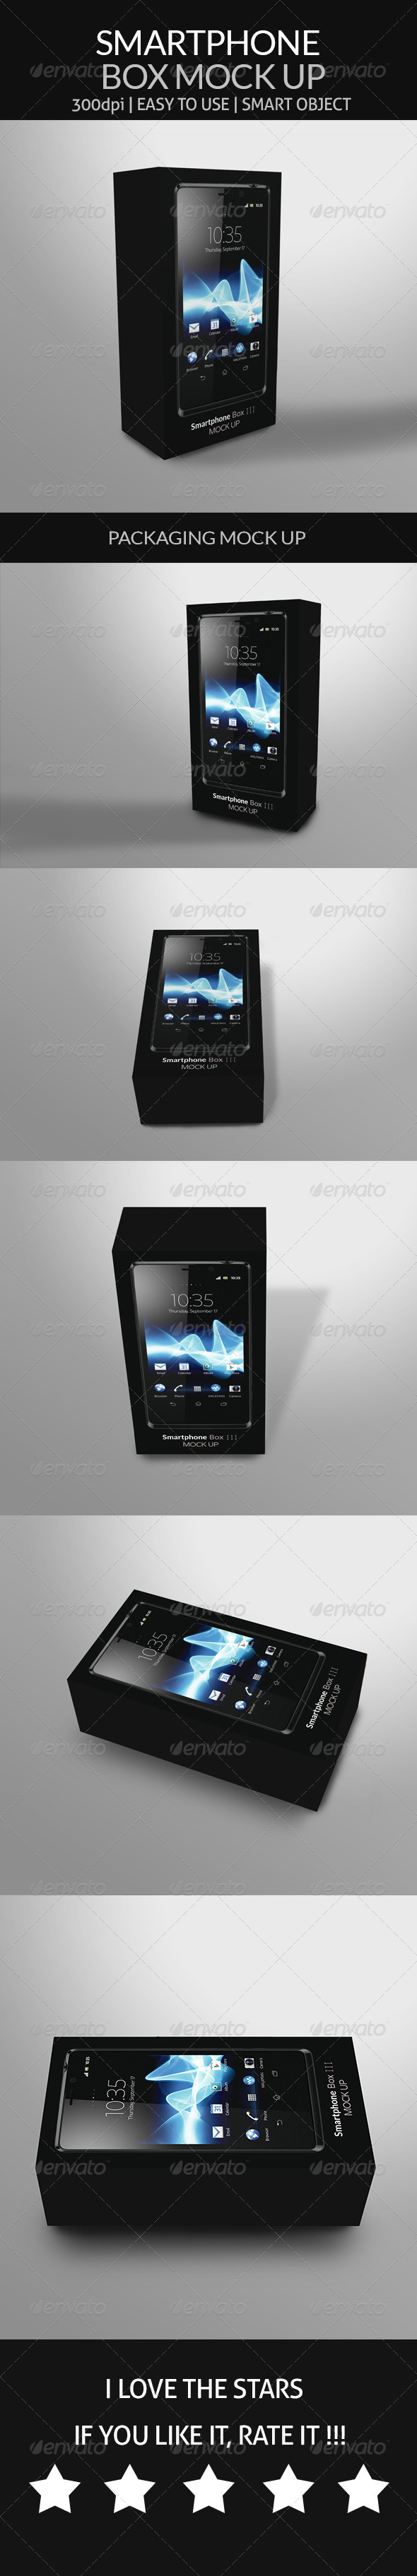 GraphicRiver Smartphone Box Mock Up 8748241